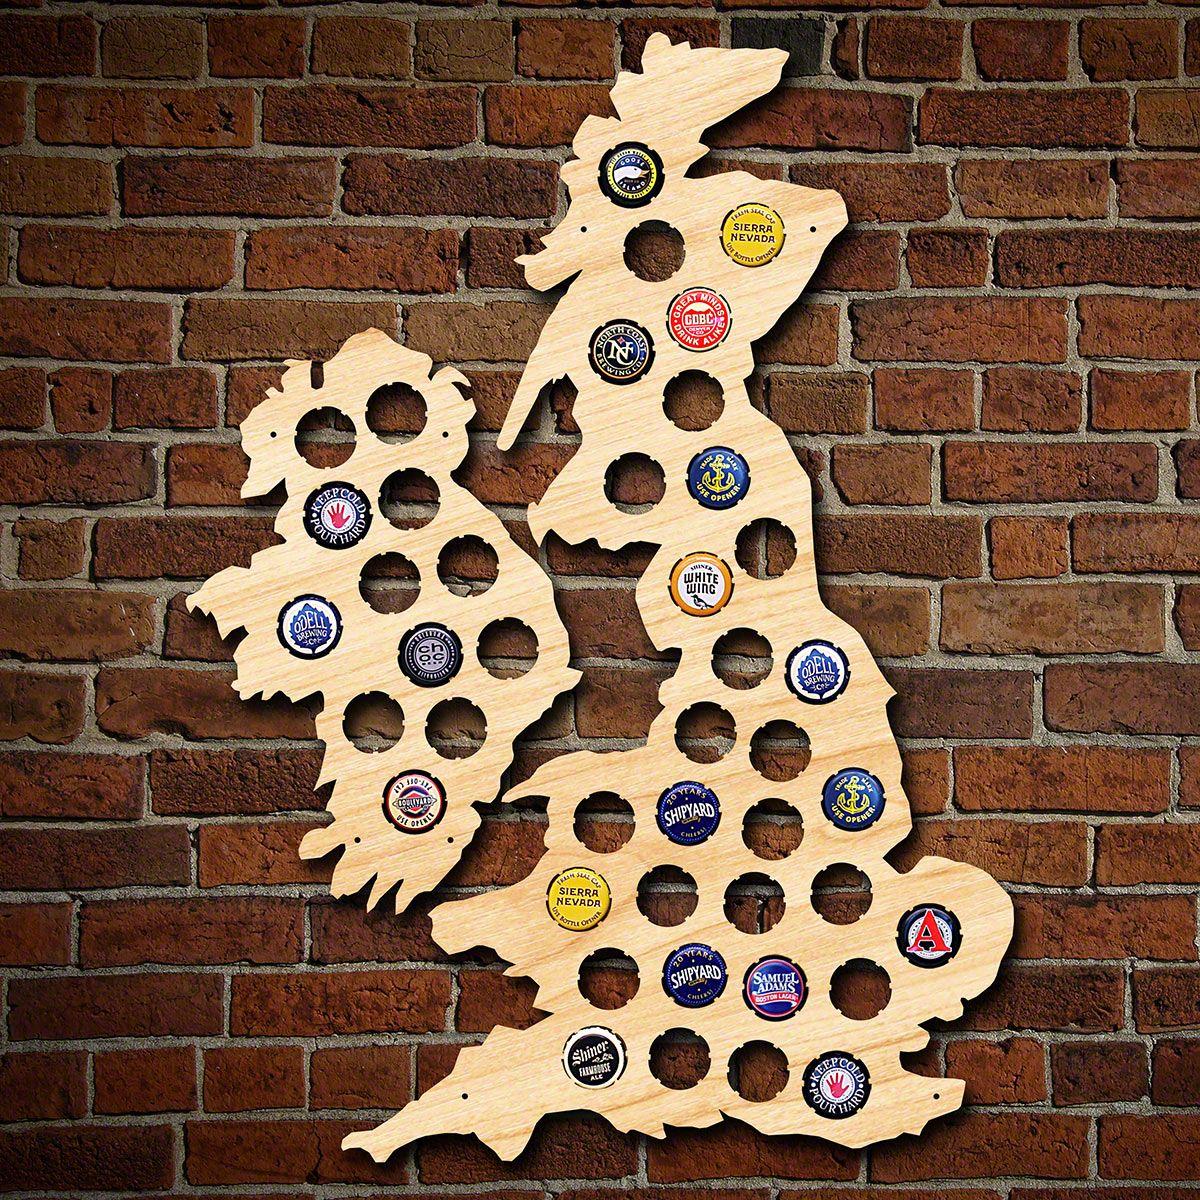 United Kingdom & Ireland Beer Cap Map